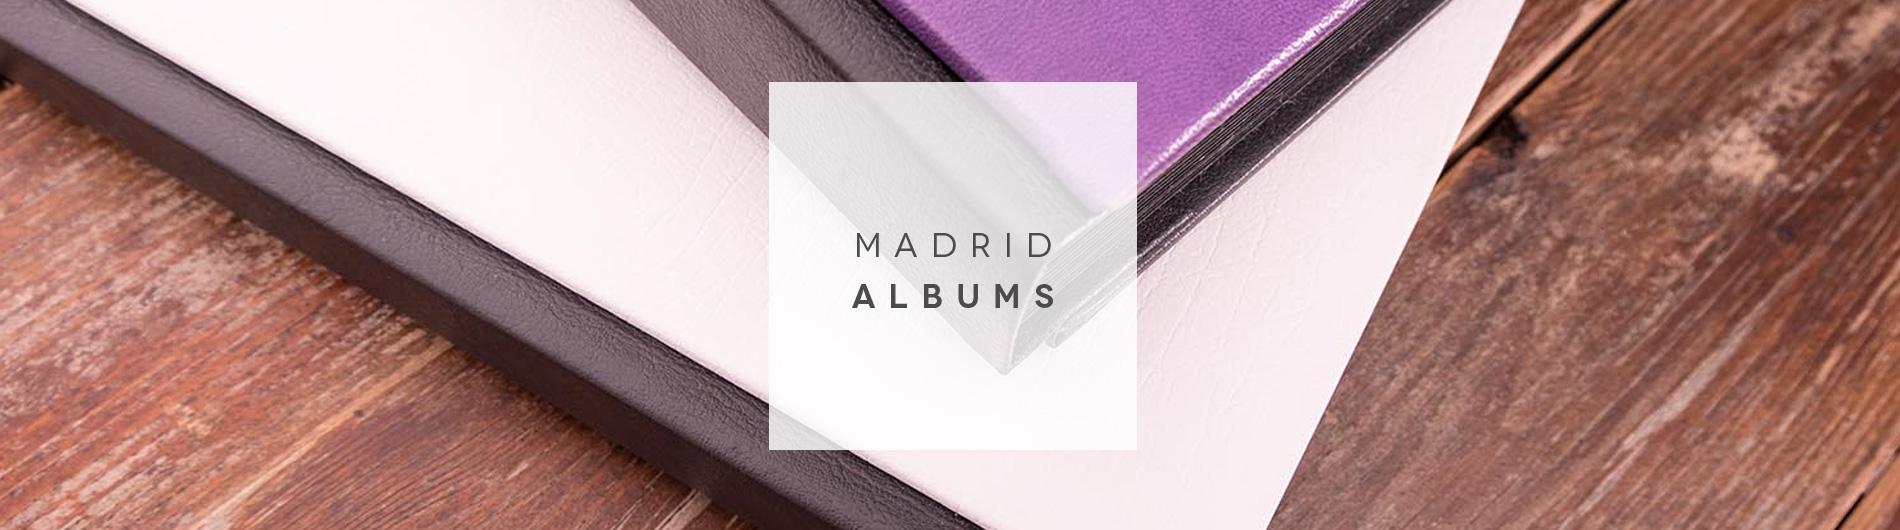 madrid albums